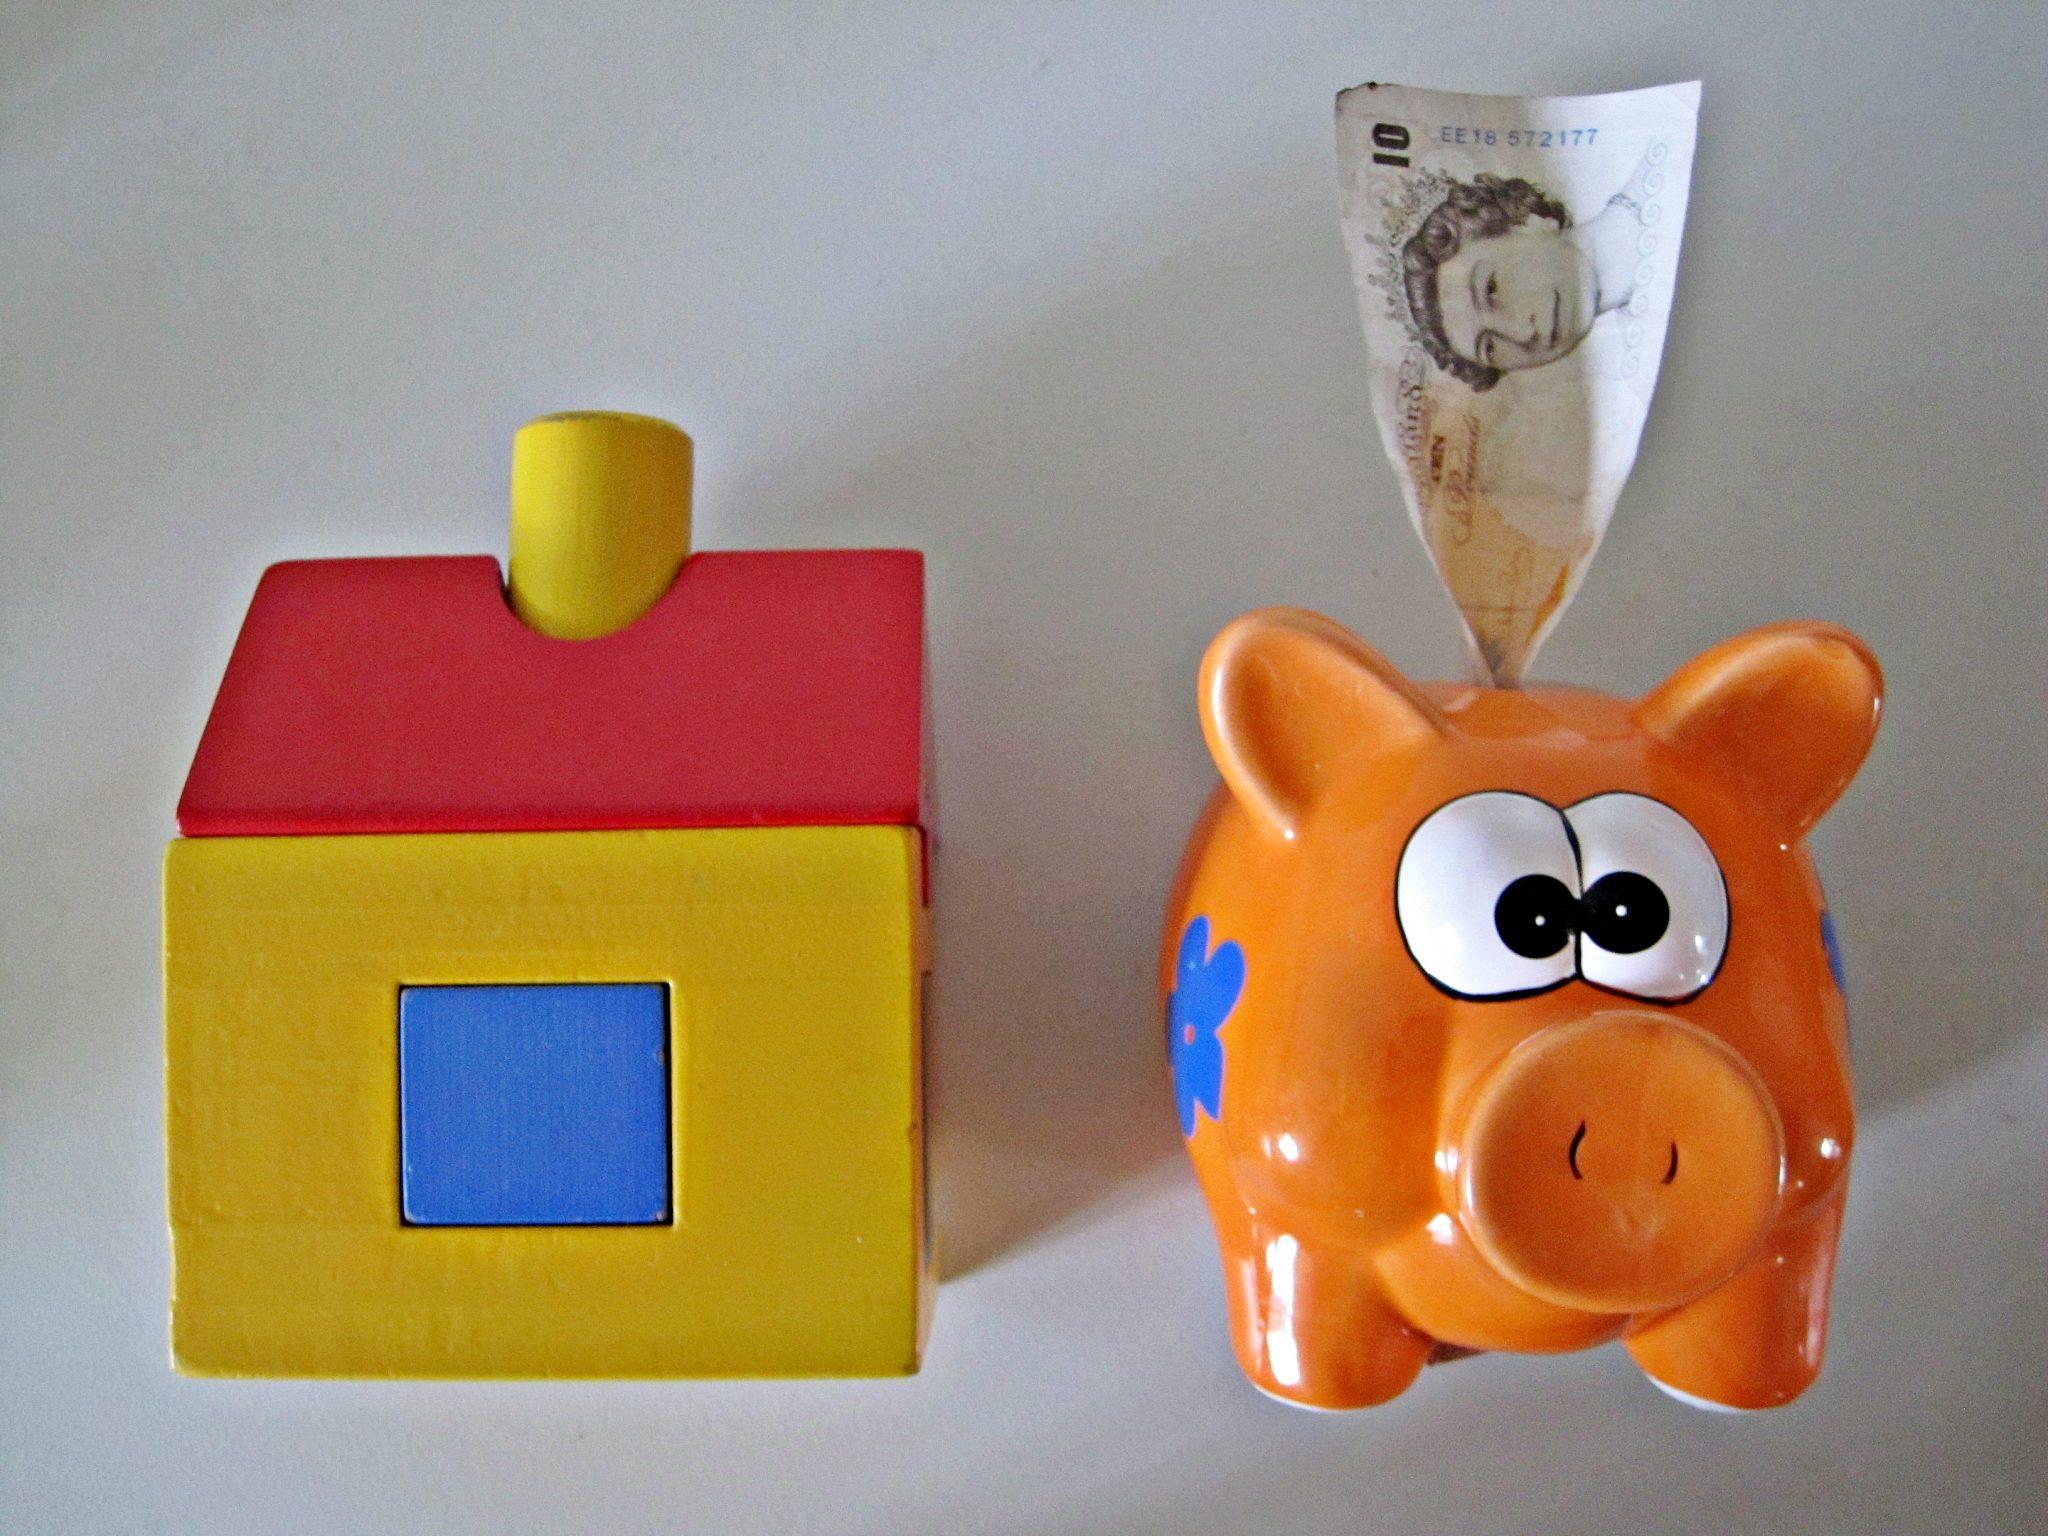 small condo purchase saves money